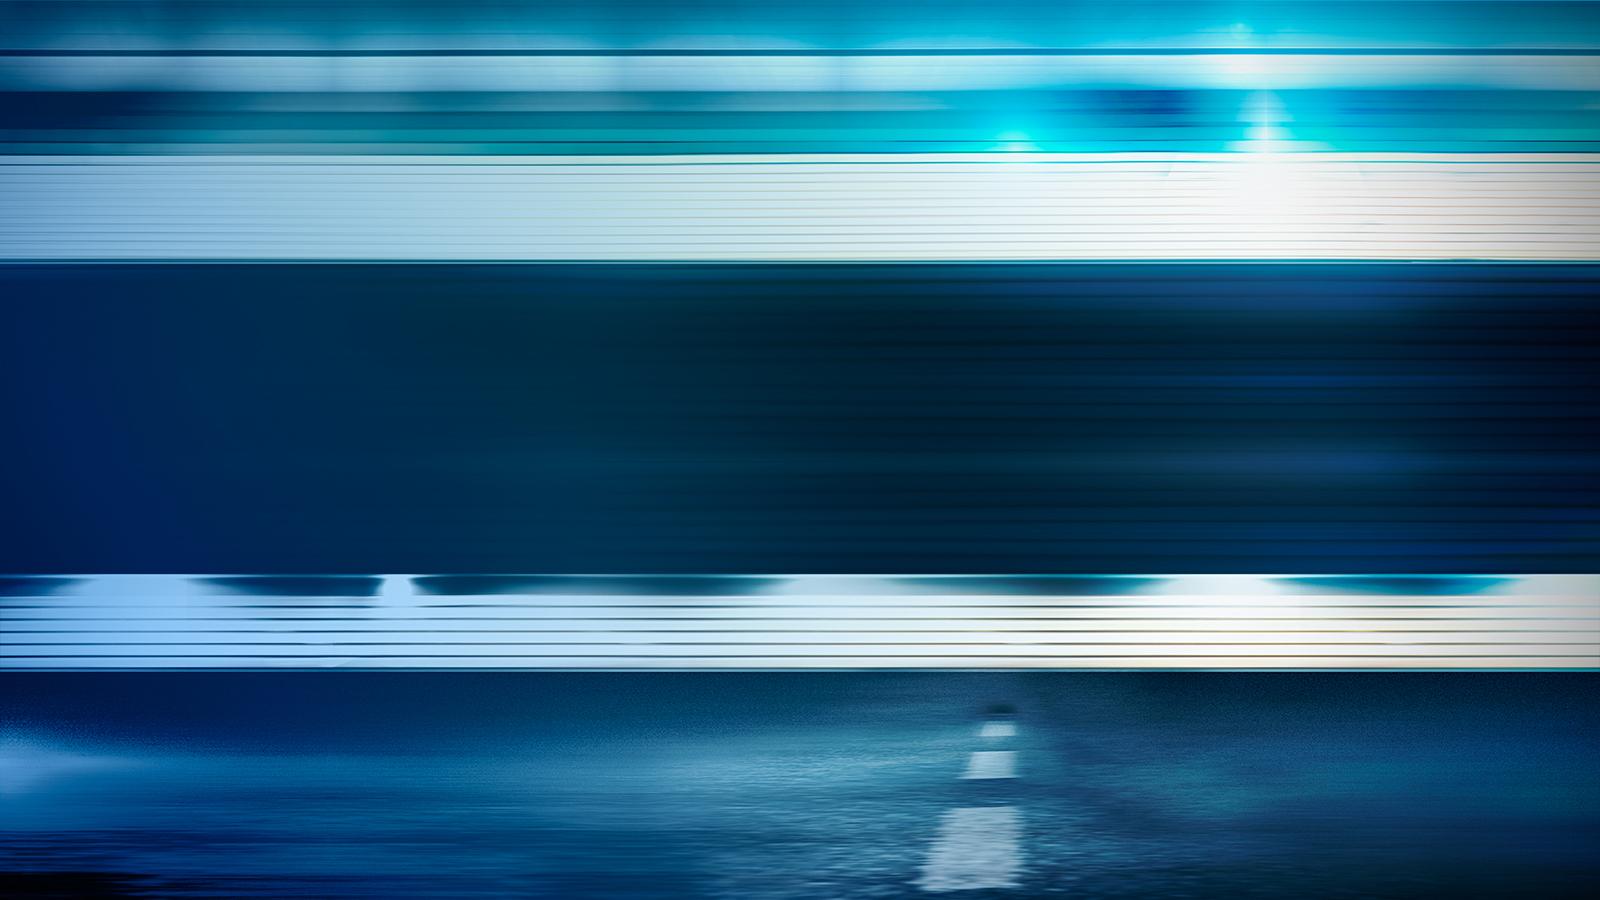 Aviation 3d Live Wallpaper Pioneering Electric Race Series Resumes Cnn Com